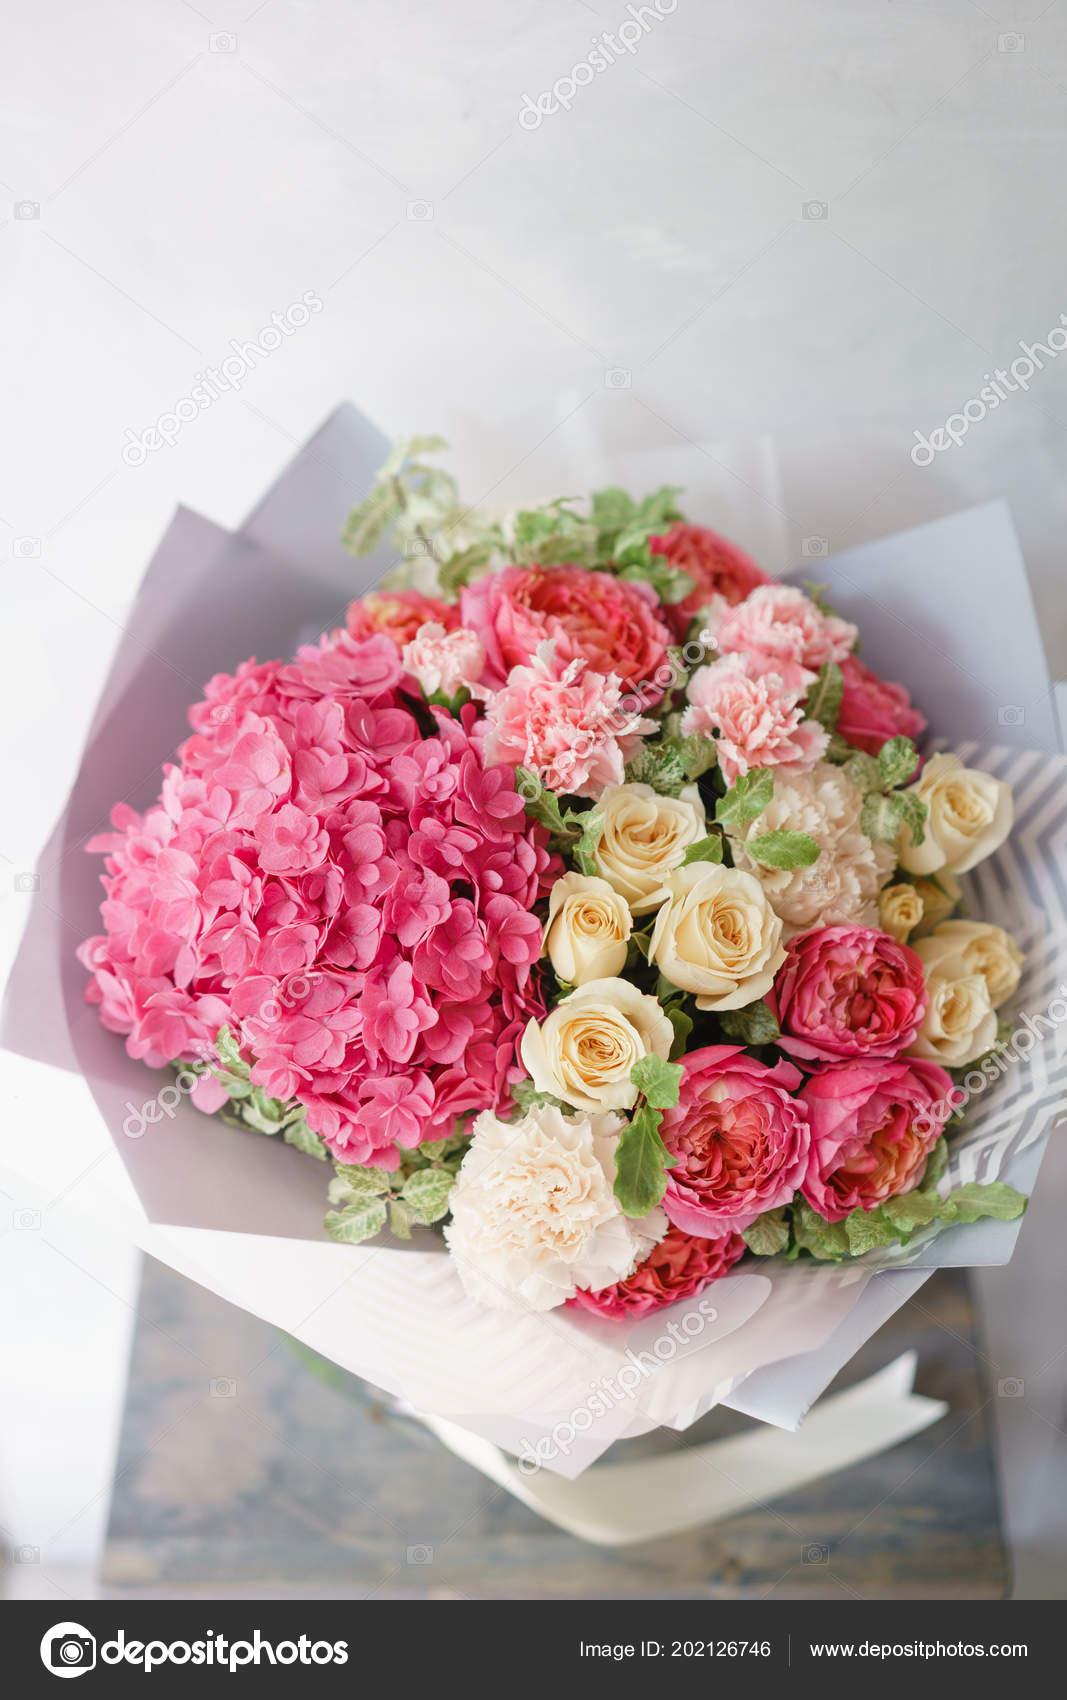 Flower arrangement with hydrangea beautiful summer bouquet color flower arrangement with hydrangea beautiful summer bouquet color light pink the concept of mightylinksfo